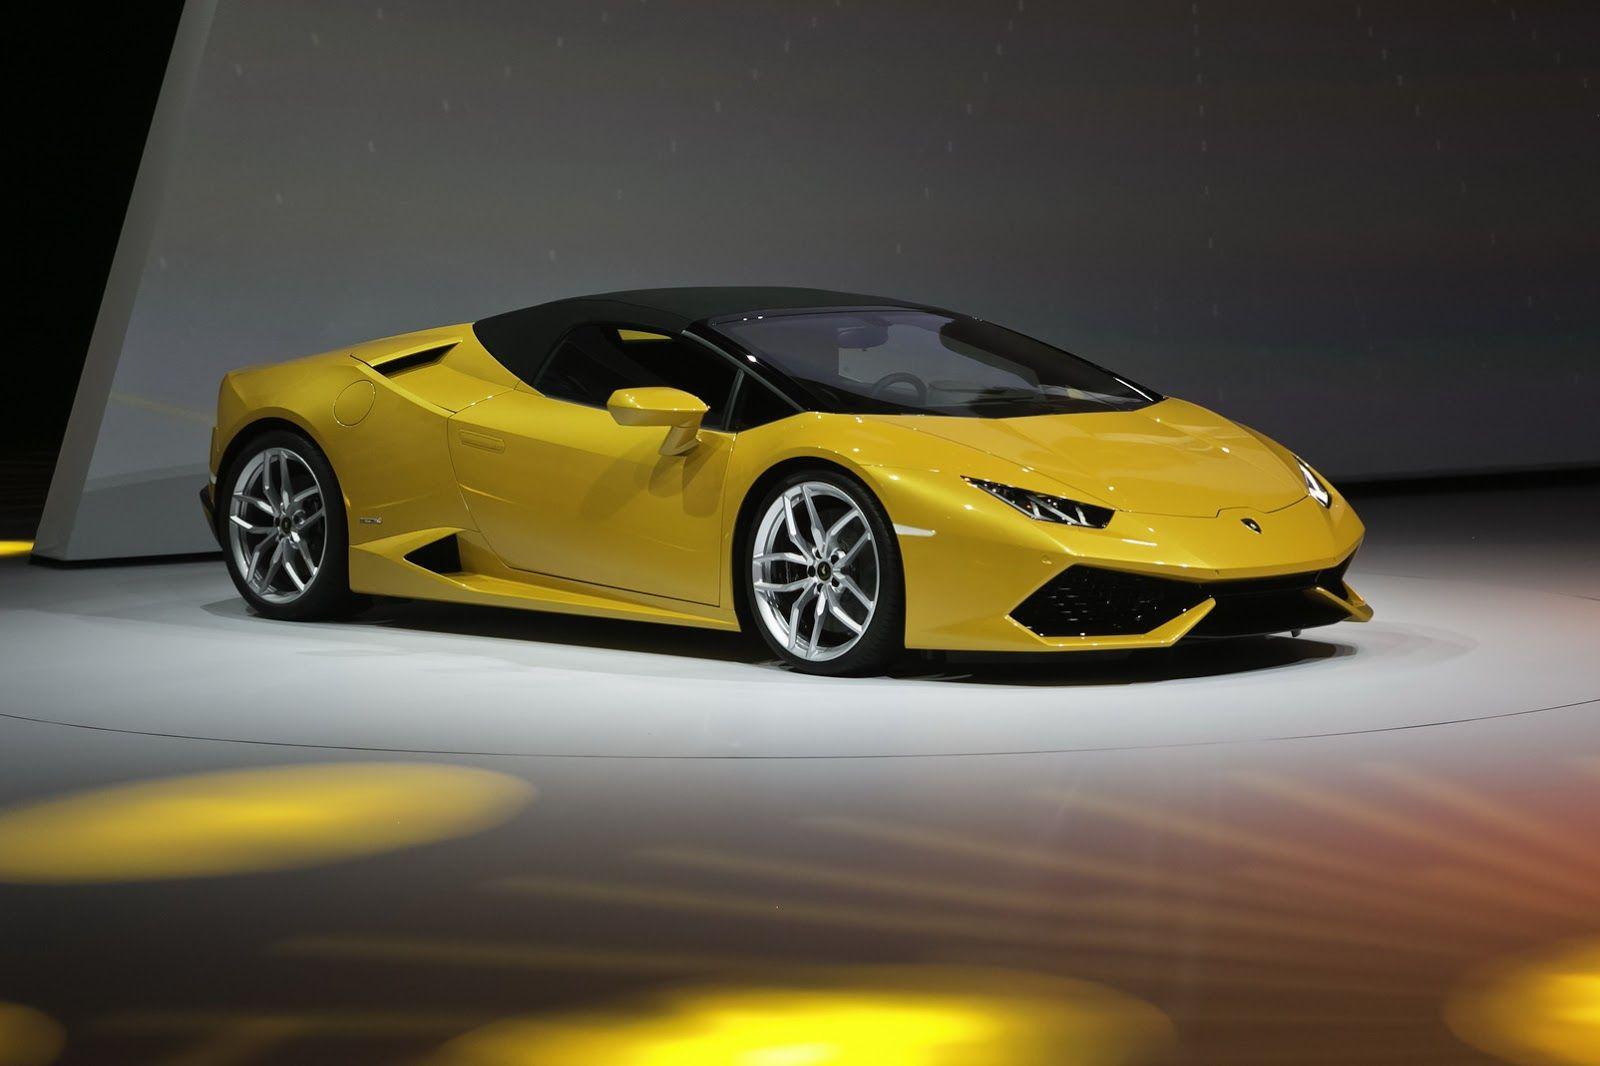 Lamborghini Huracan LP Spyder AU Wallpapers and HD | Art Wallpapers ...